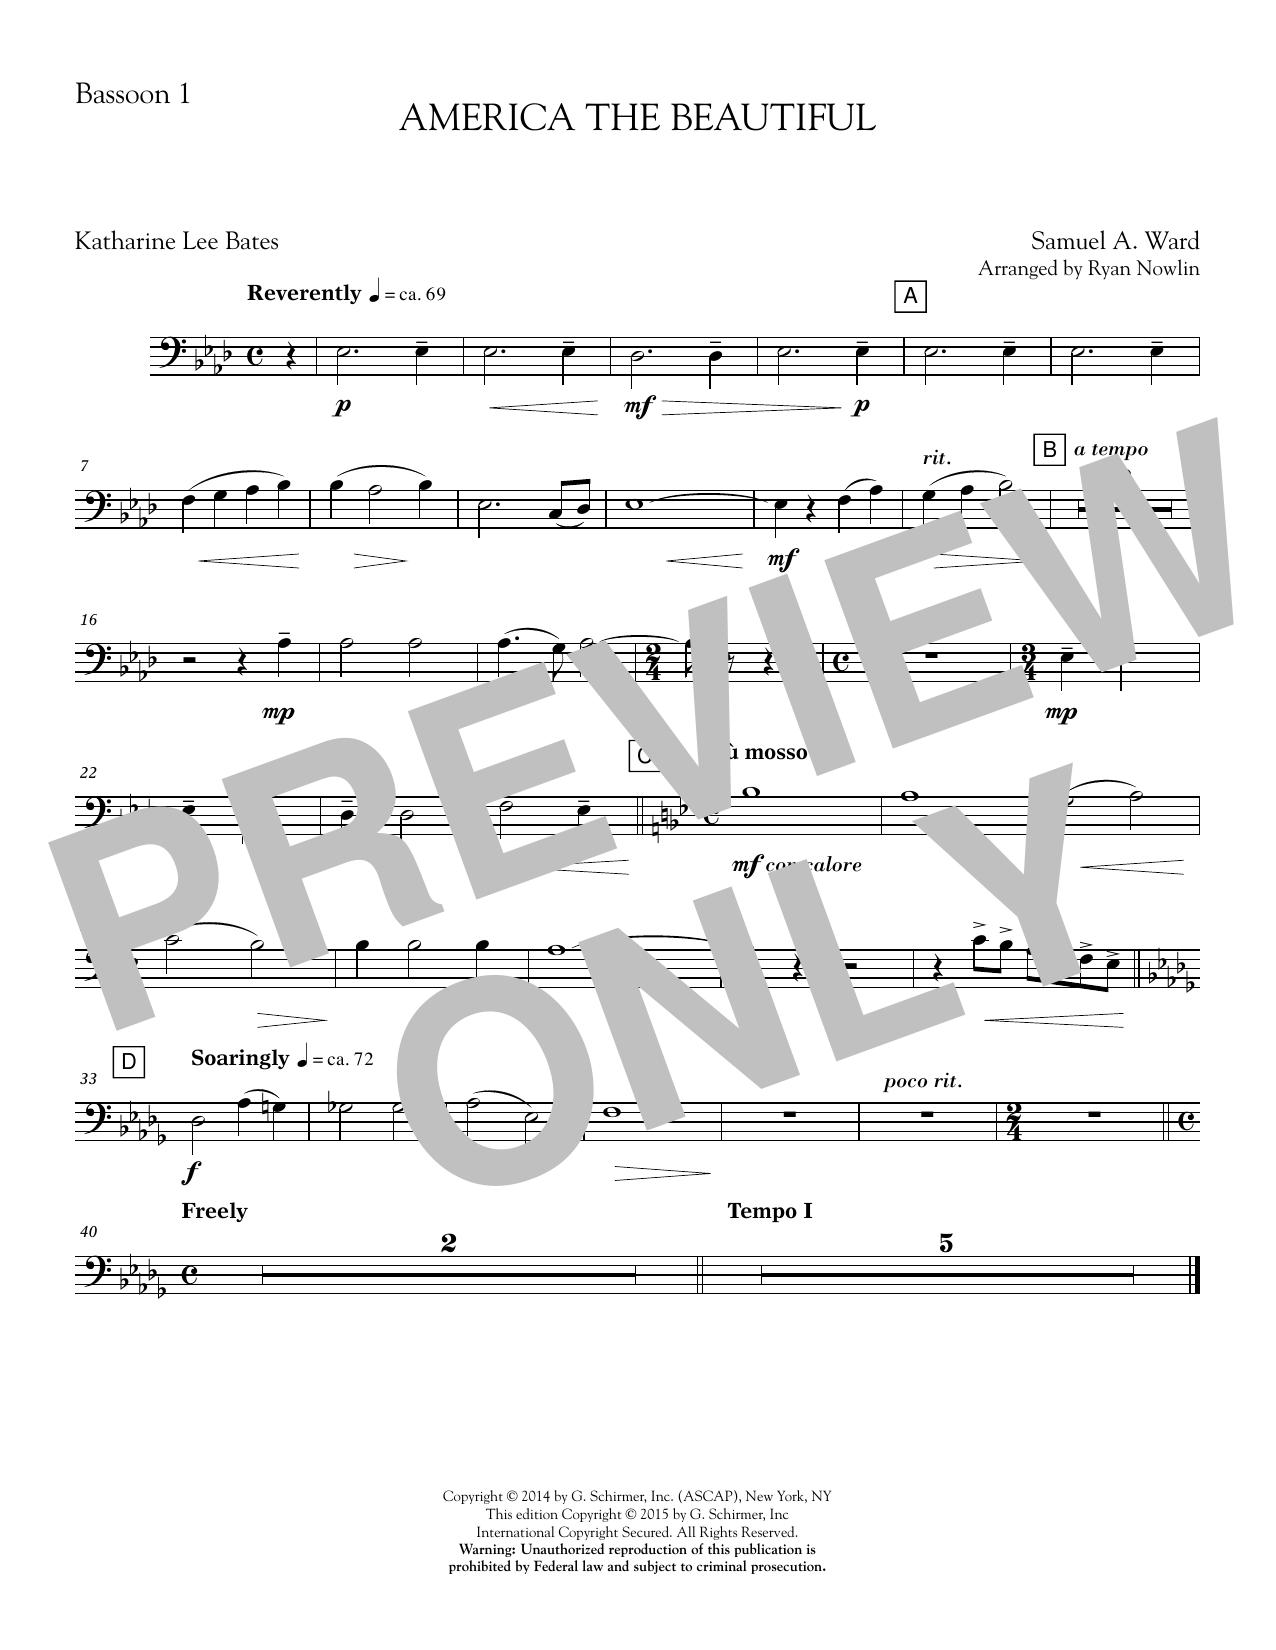 America, the Beautiful - Bassoon 1 Sheet Music